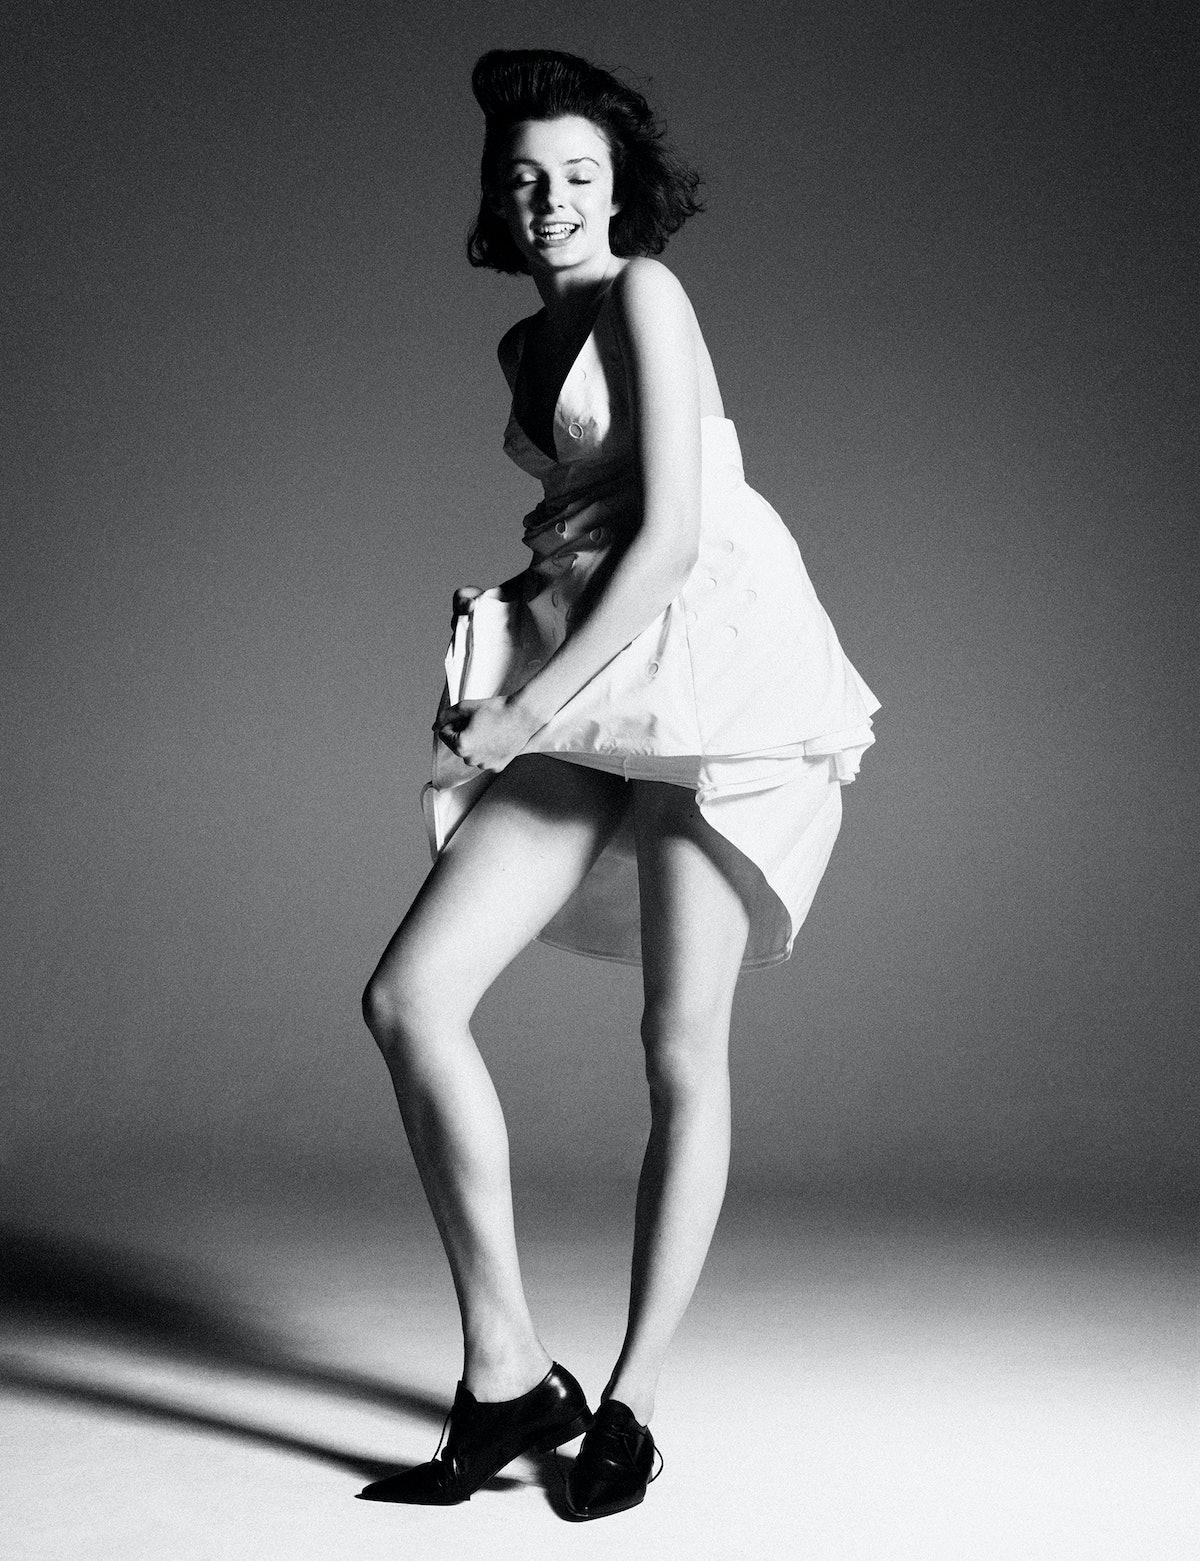 Model Grace Clover wears a Prada dress; Maison Margiela shoes.